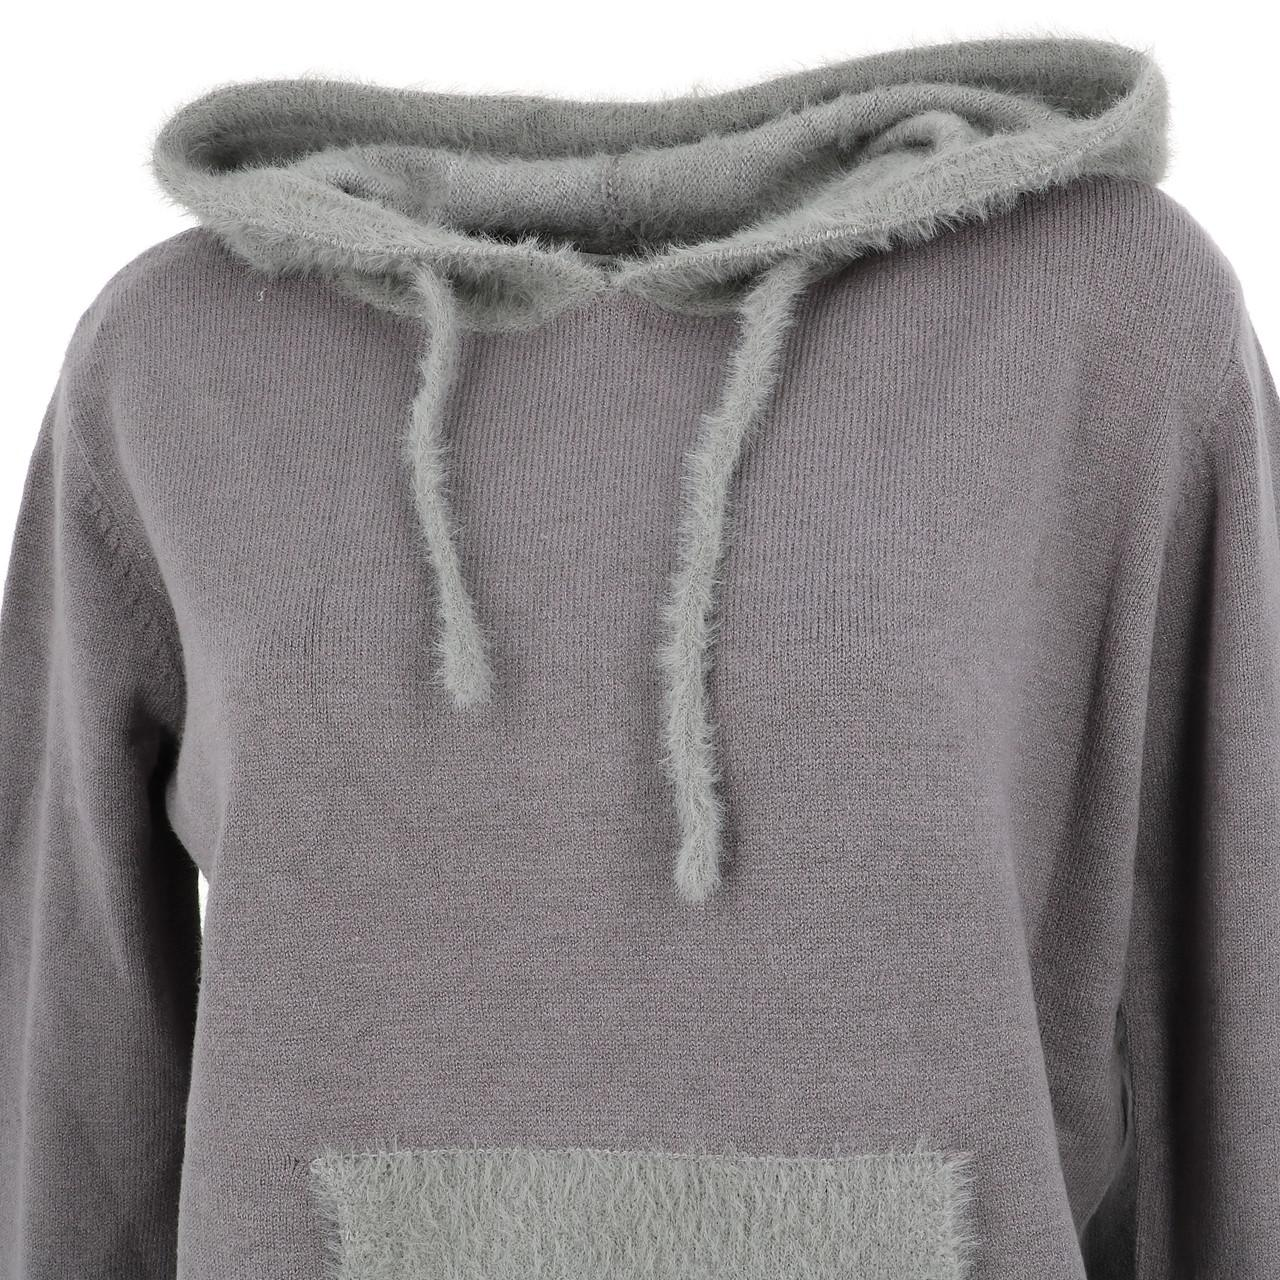 Sweat-Lcouture-Mohair-cap-w-gris-Gris-53717-Neuf miniature 2